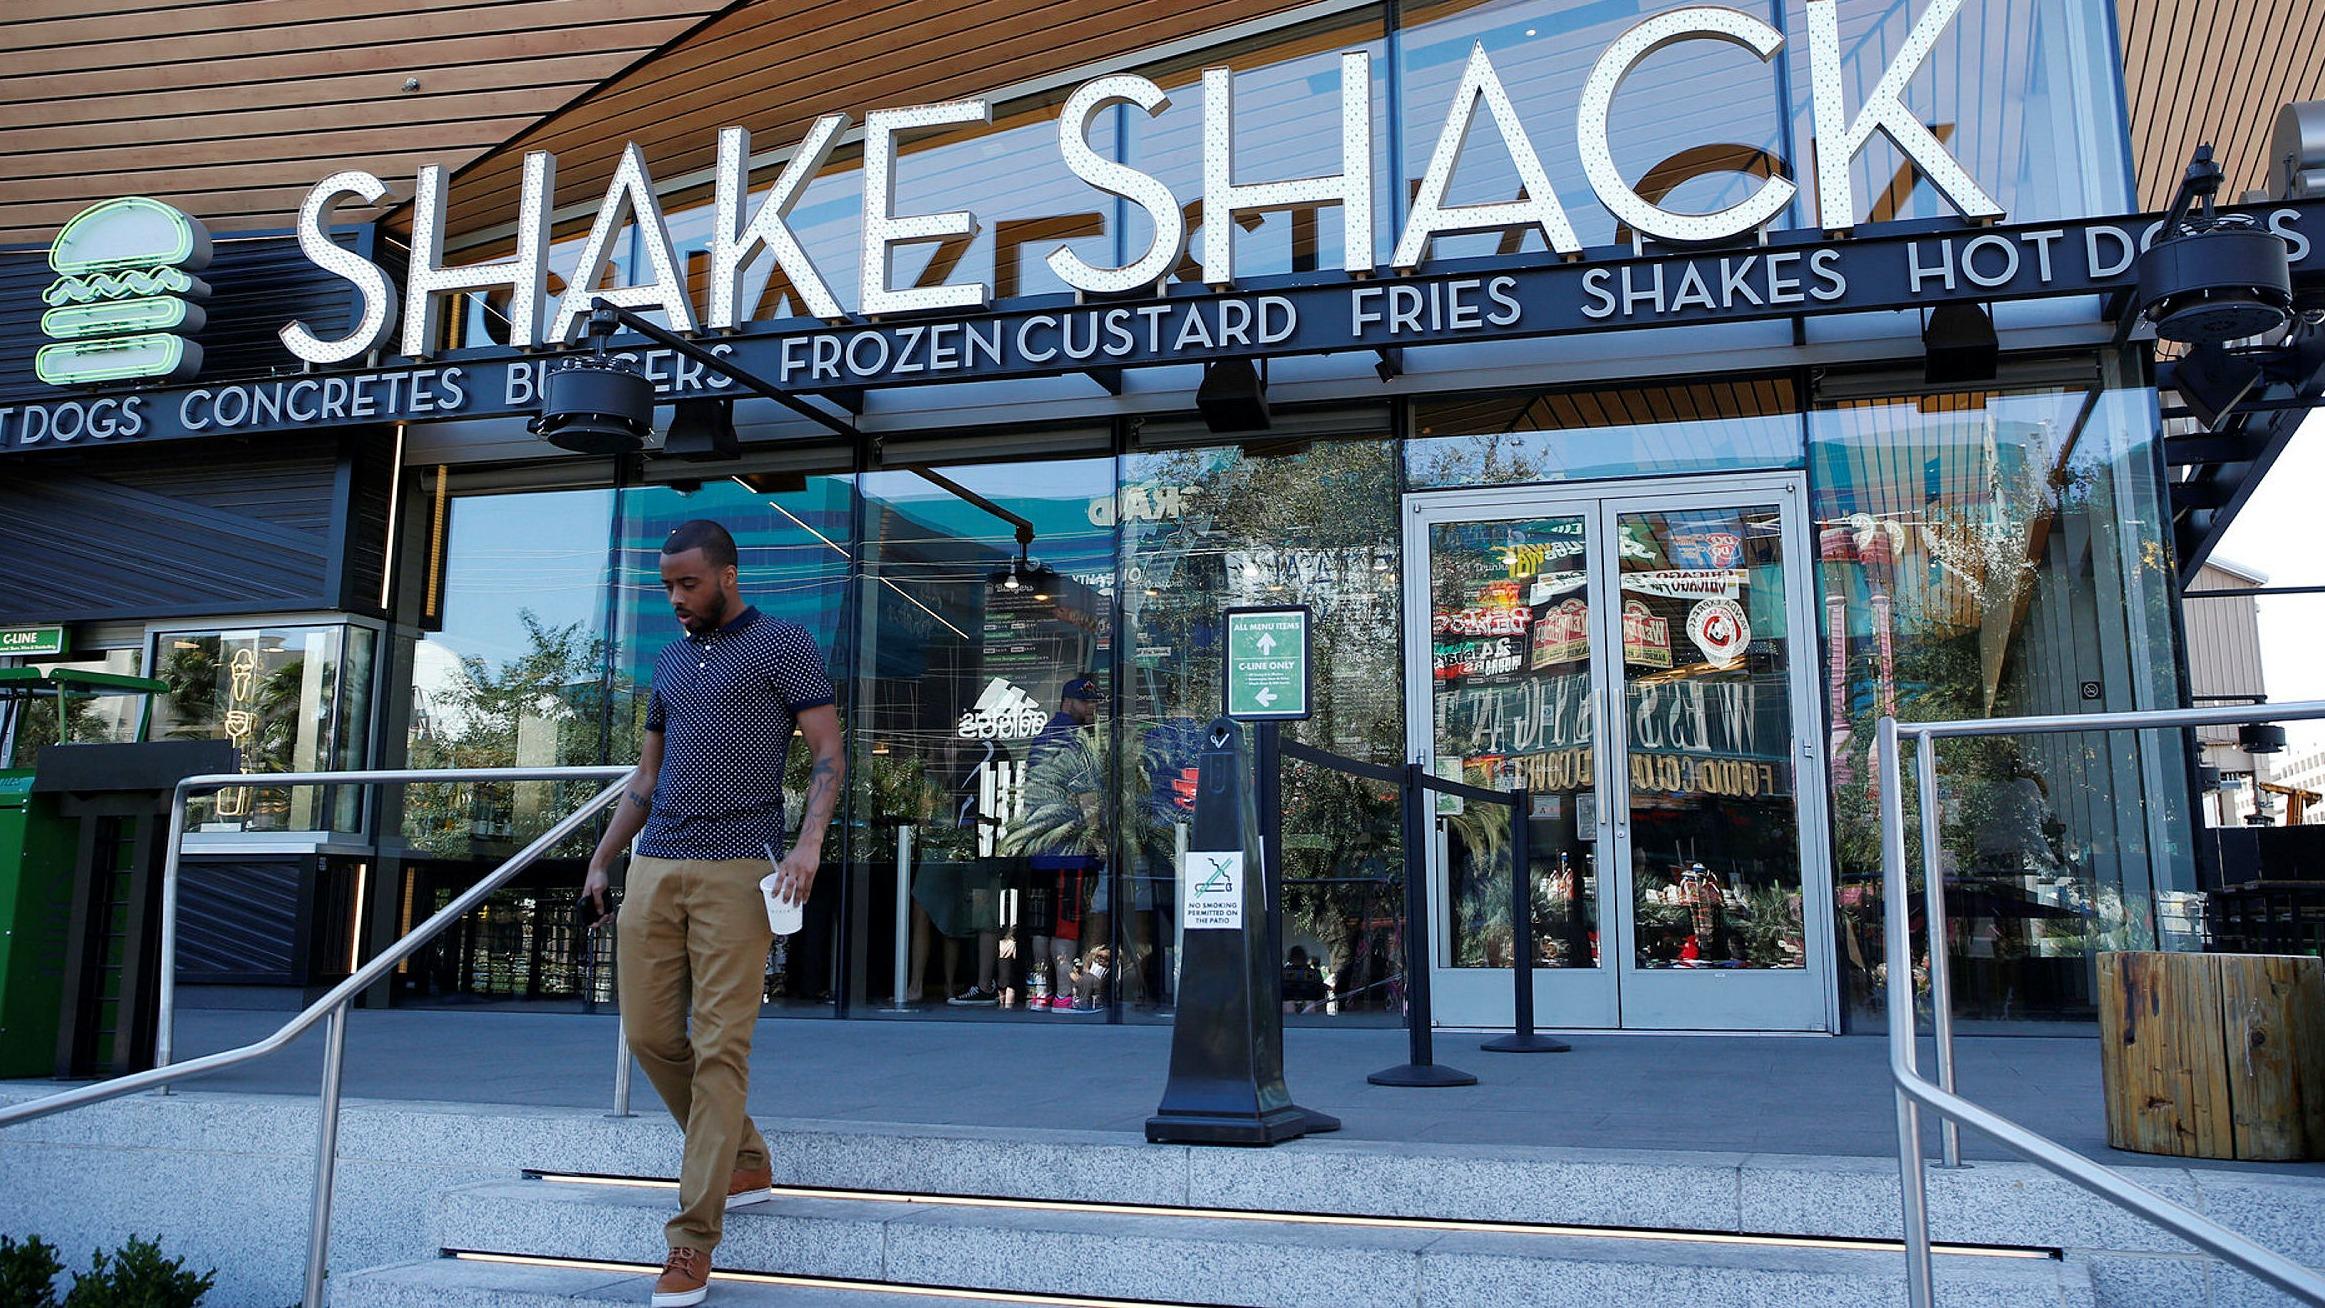 Shake Shack Introduces 'Pride Shake' Shake Shack for LGBT Month 2021